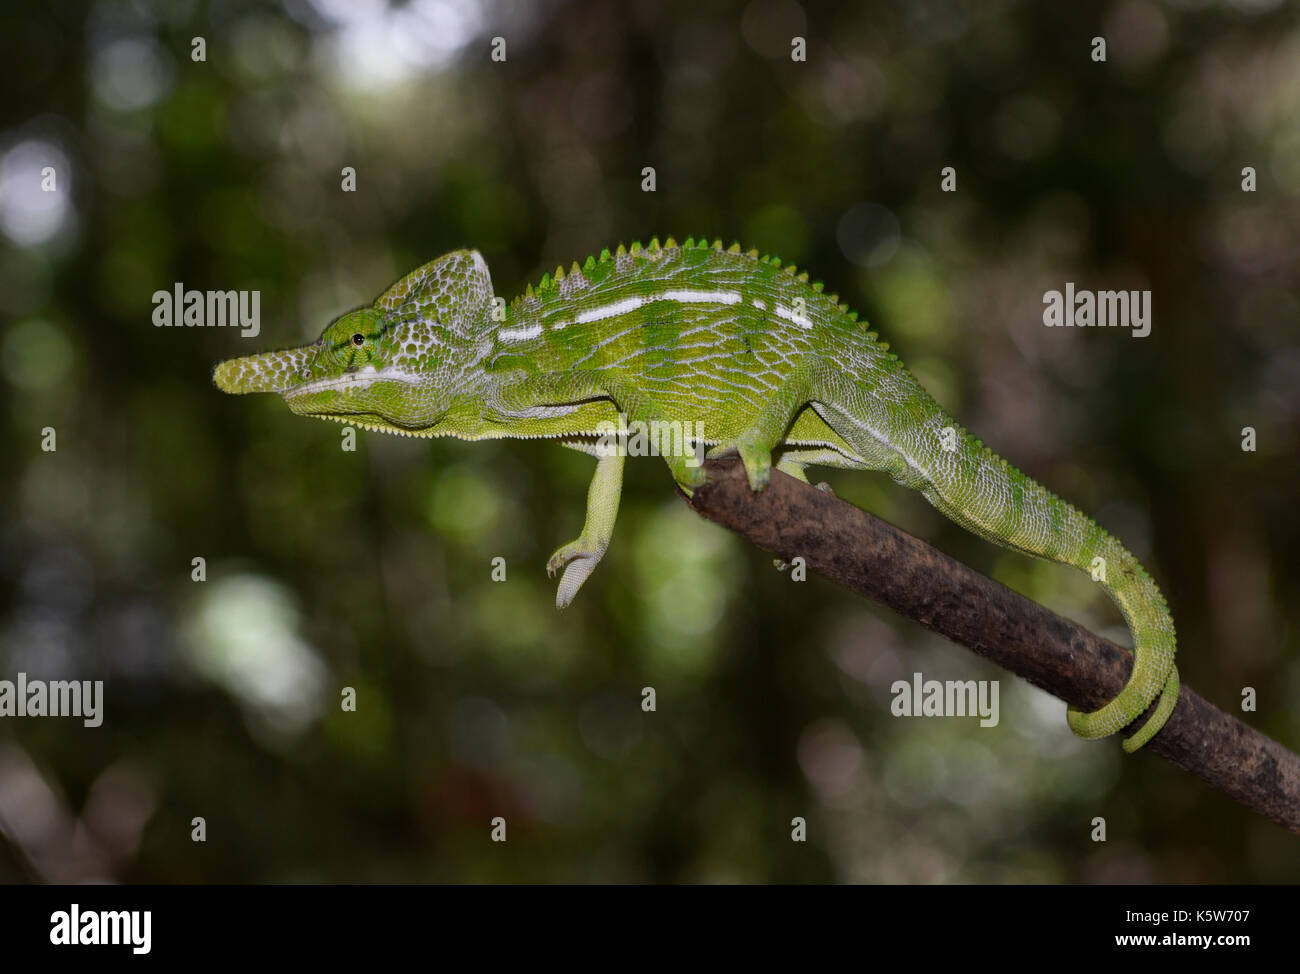 Short-lived chameleon species of the world (Furcifer labordi), male, dry forests of Kirindy, Western Madagascar, Madagascar - Stock Image